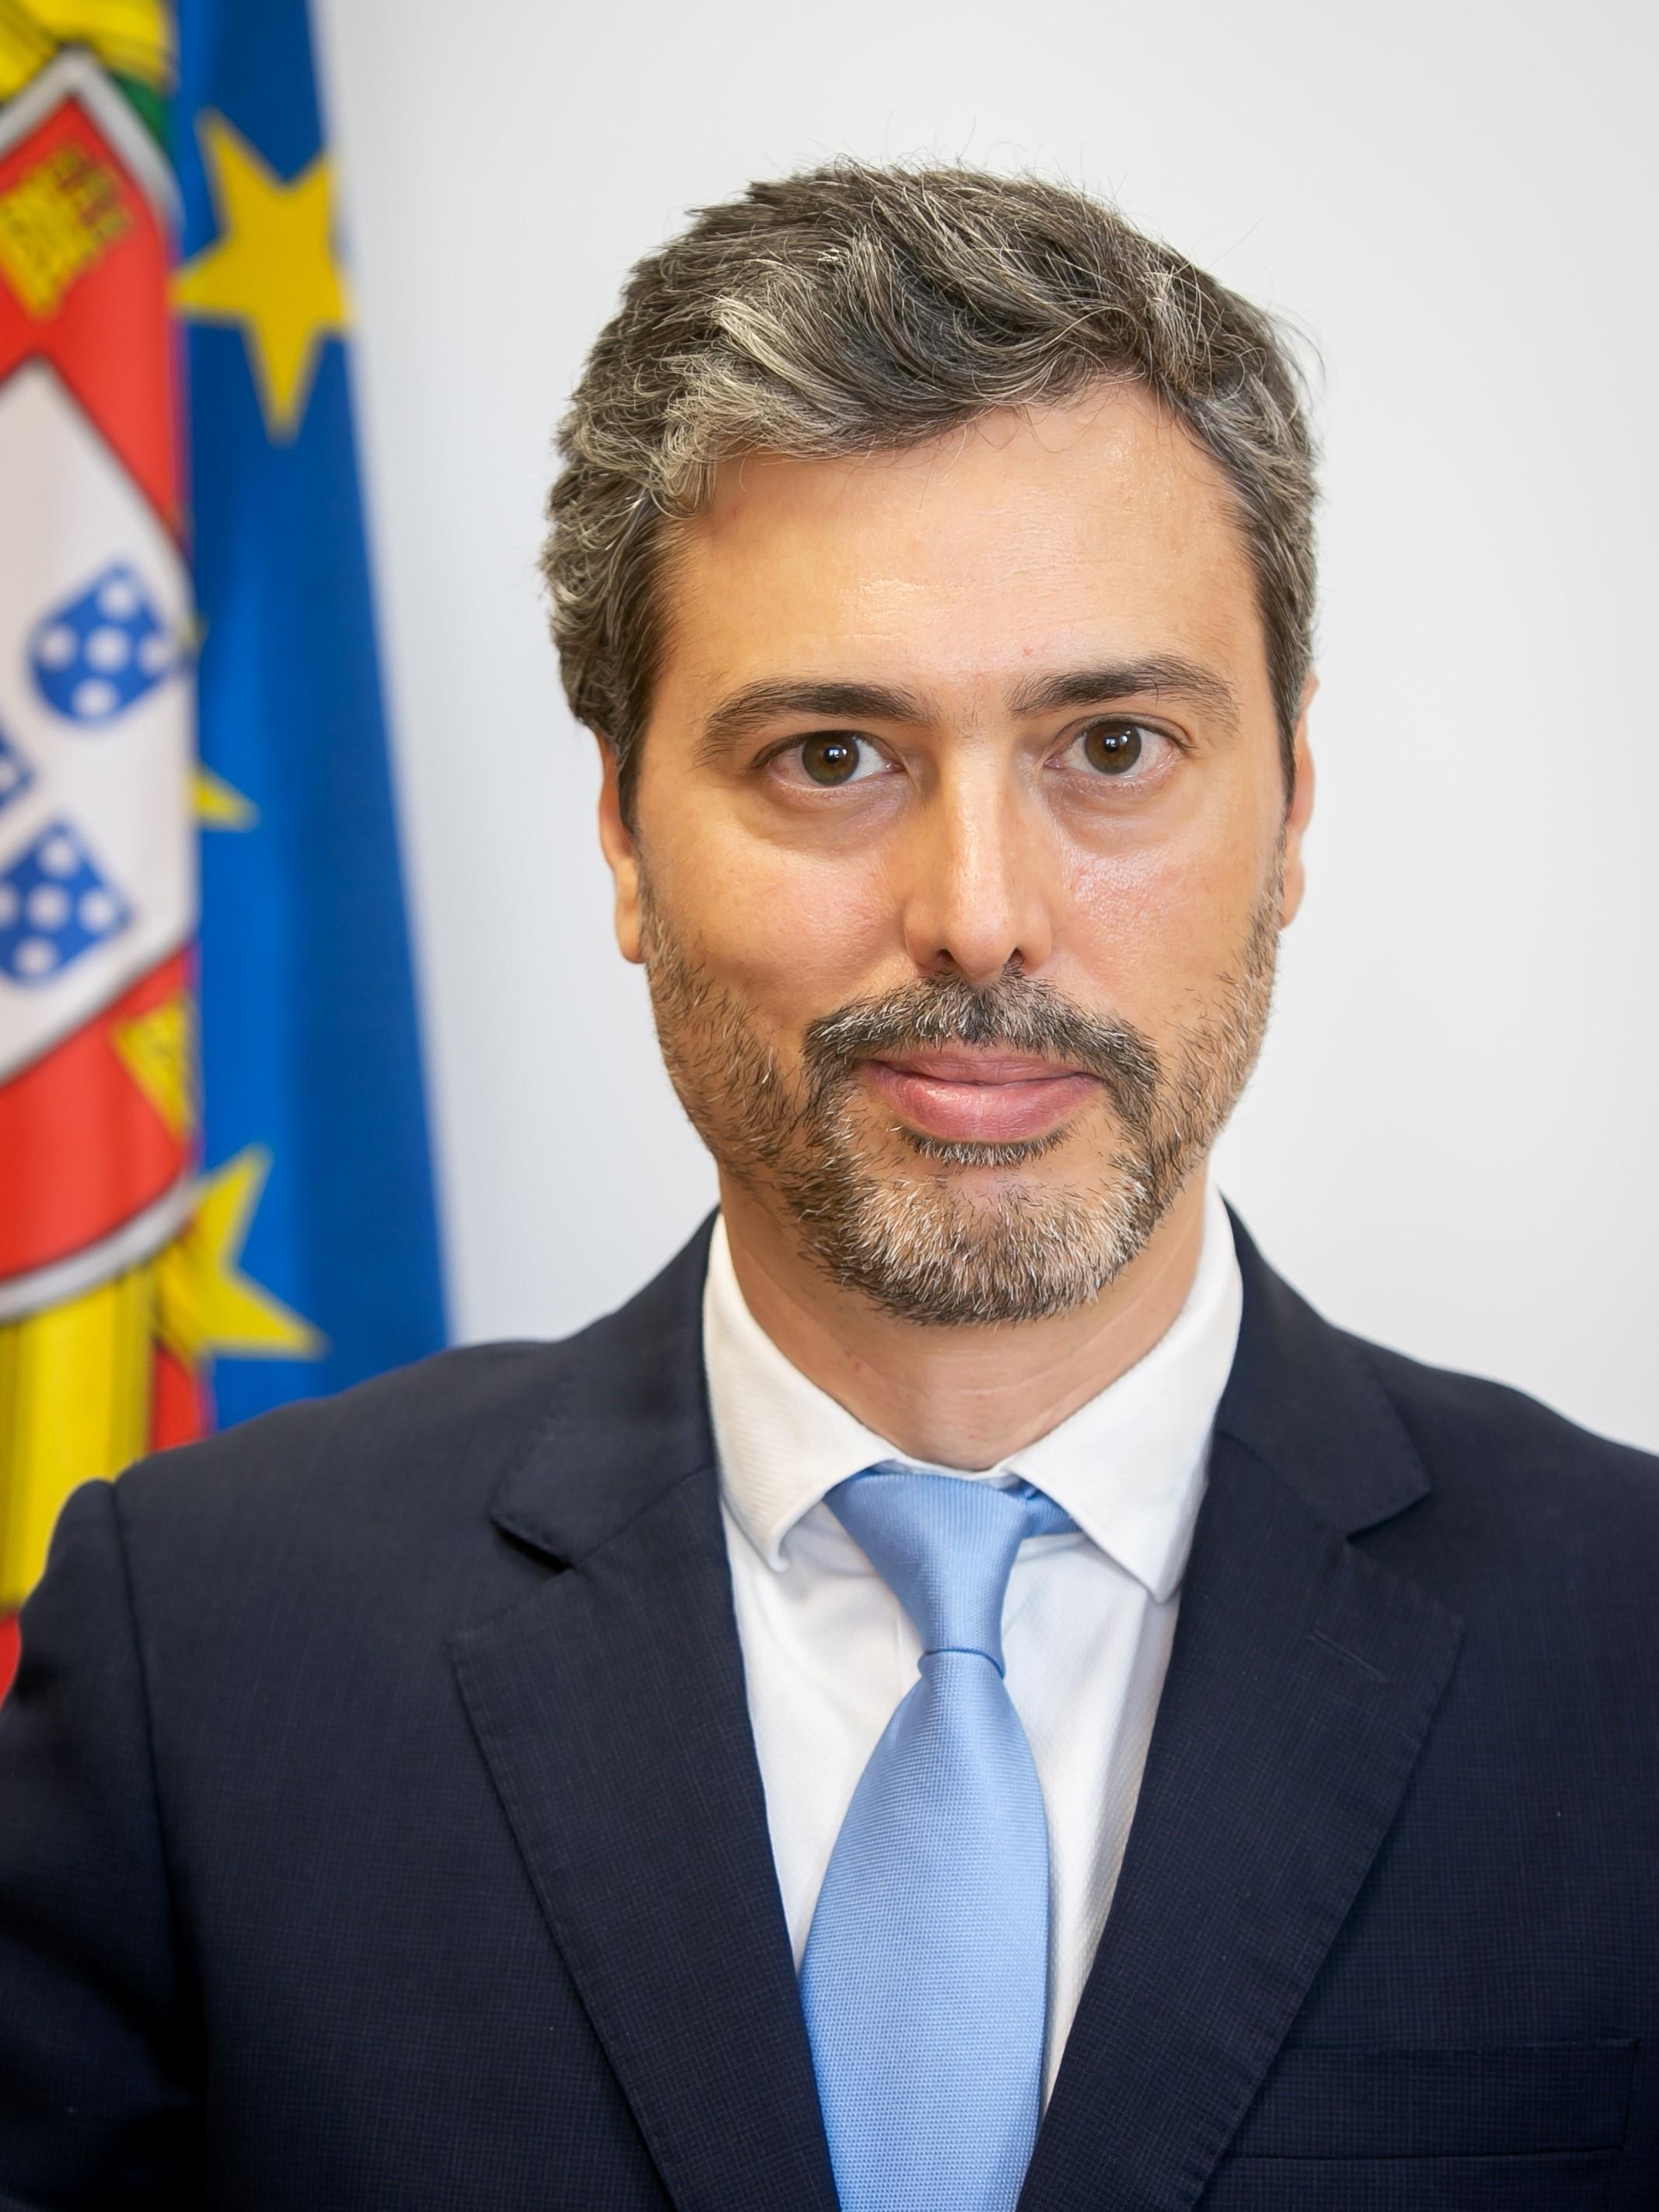 Luís Goes Pinheiro